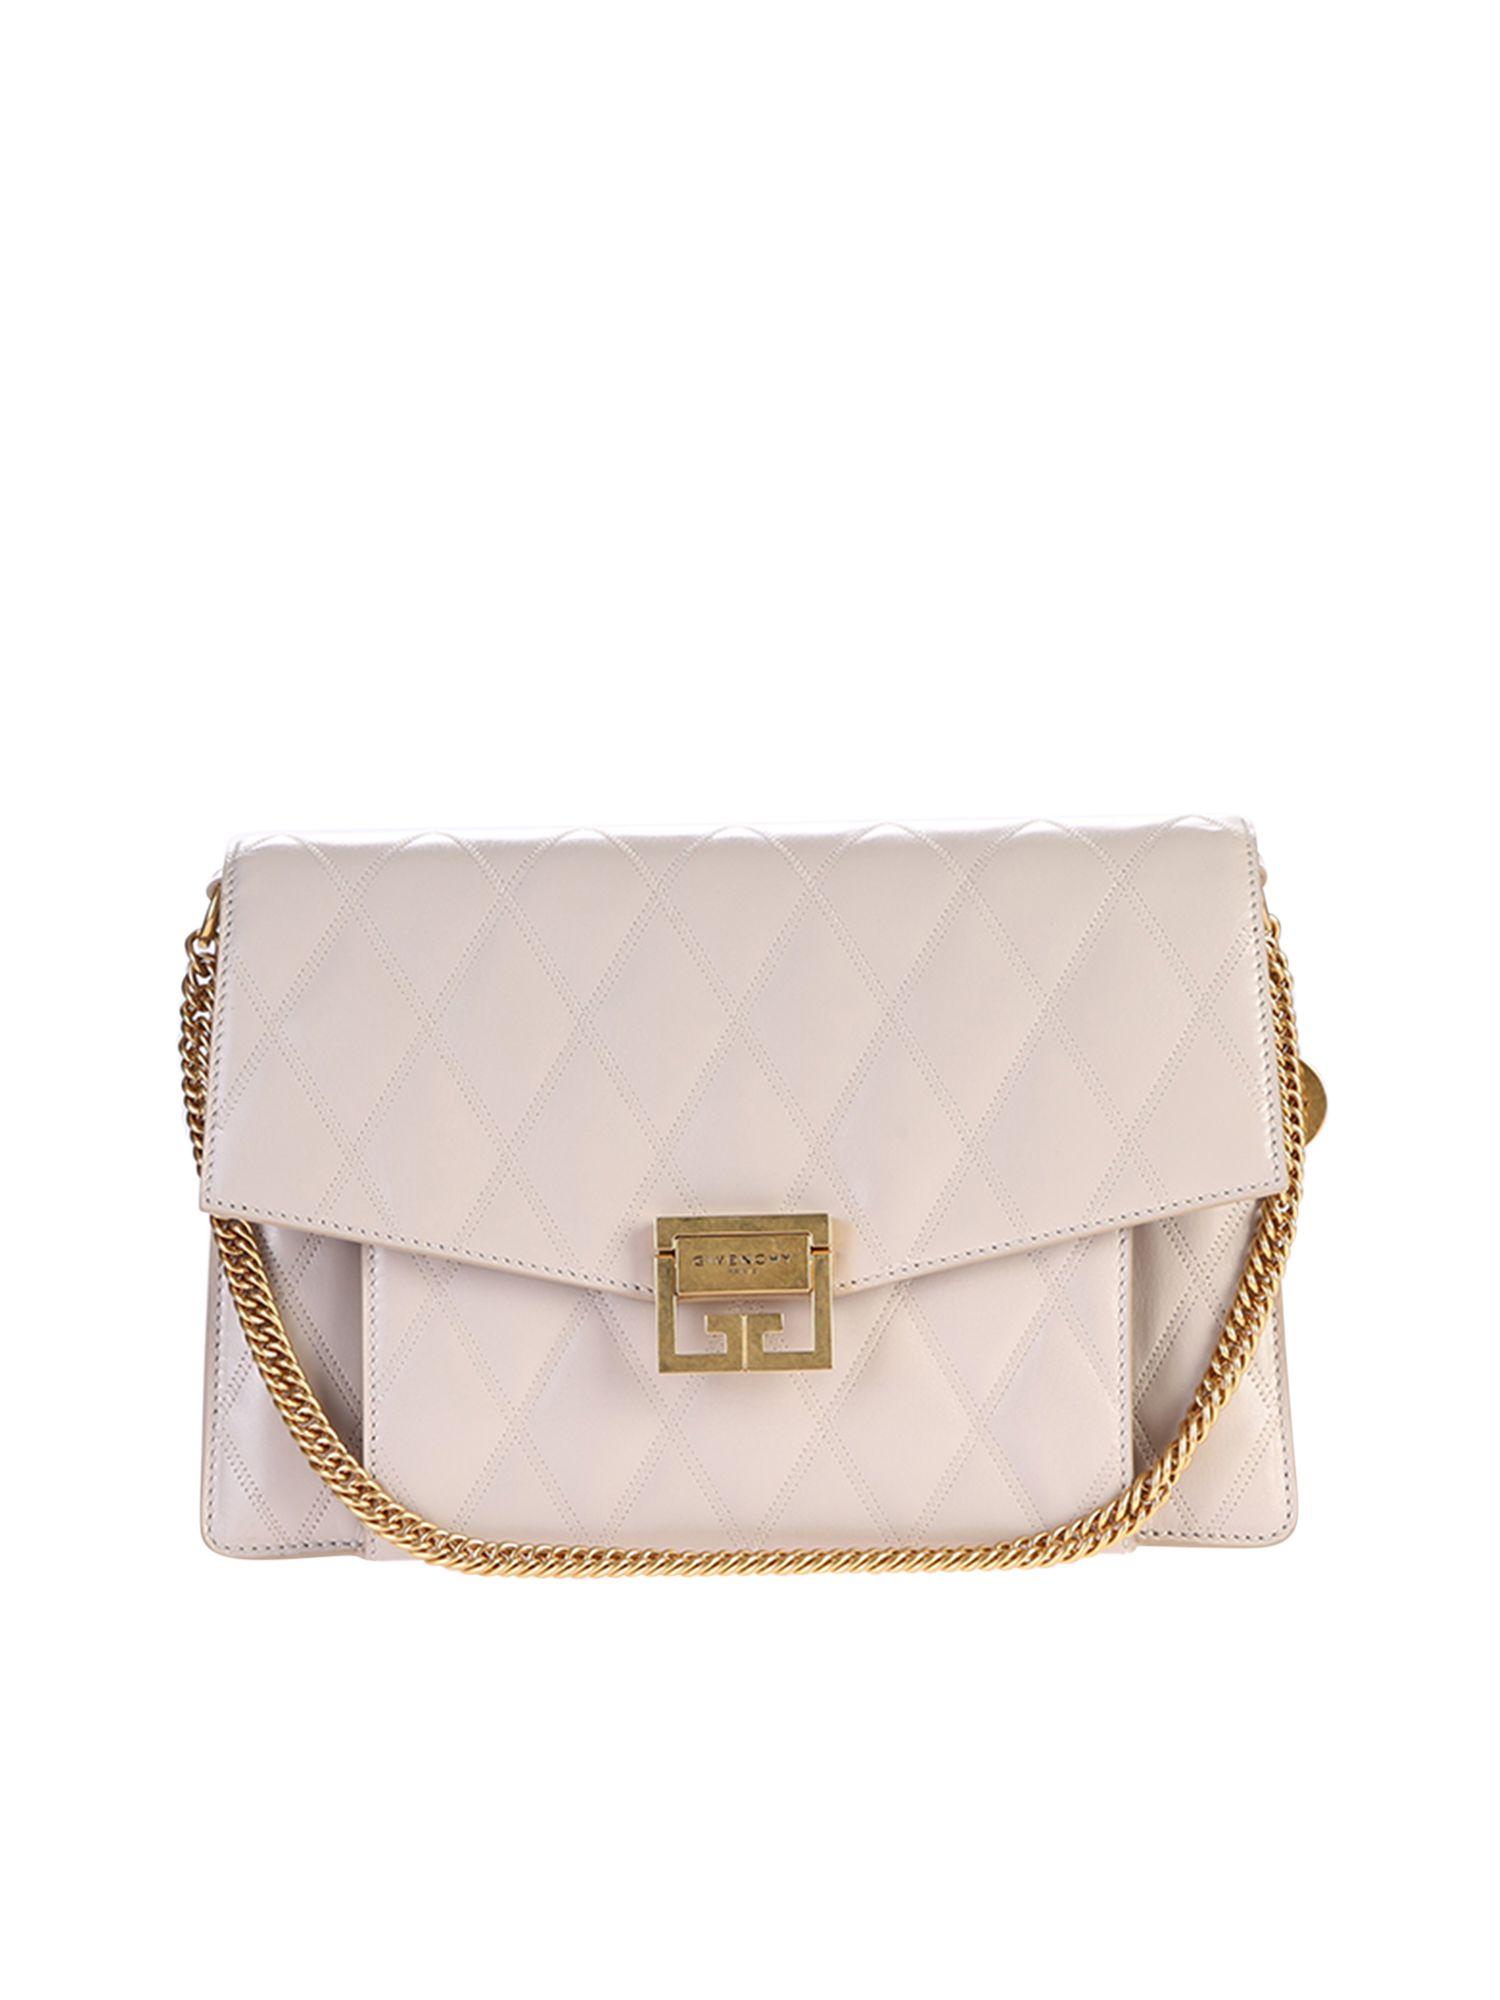 Givenchy Givenchy Medium Gv3 Bag - Beige - 10800303  5f09fb169d1dc